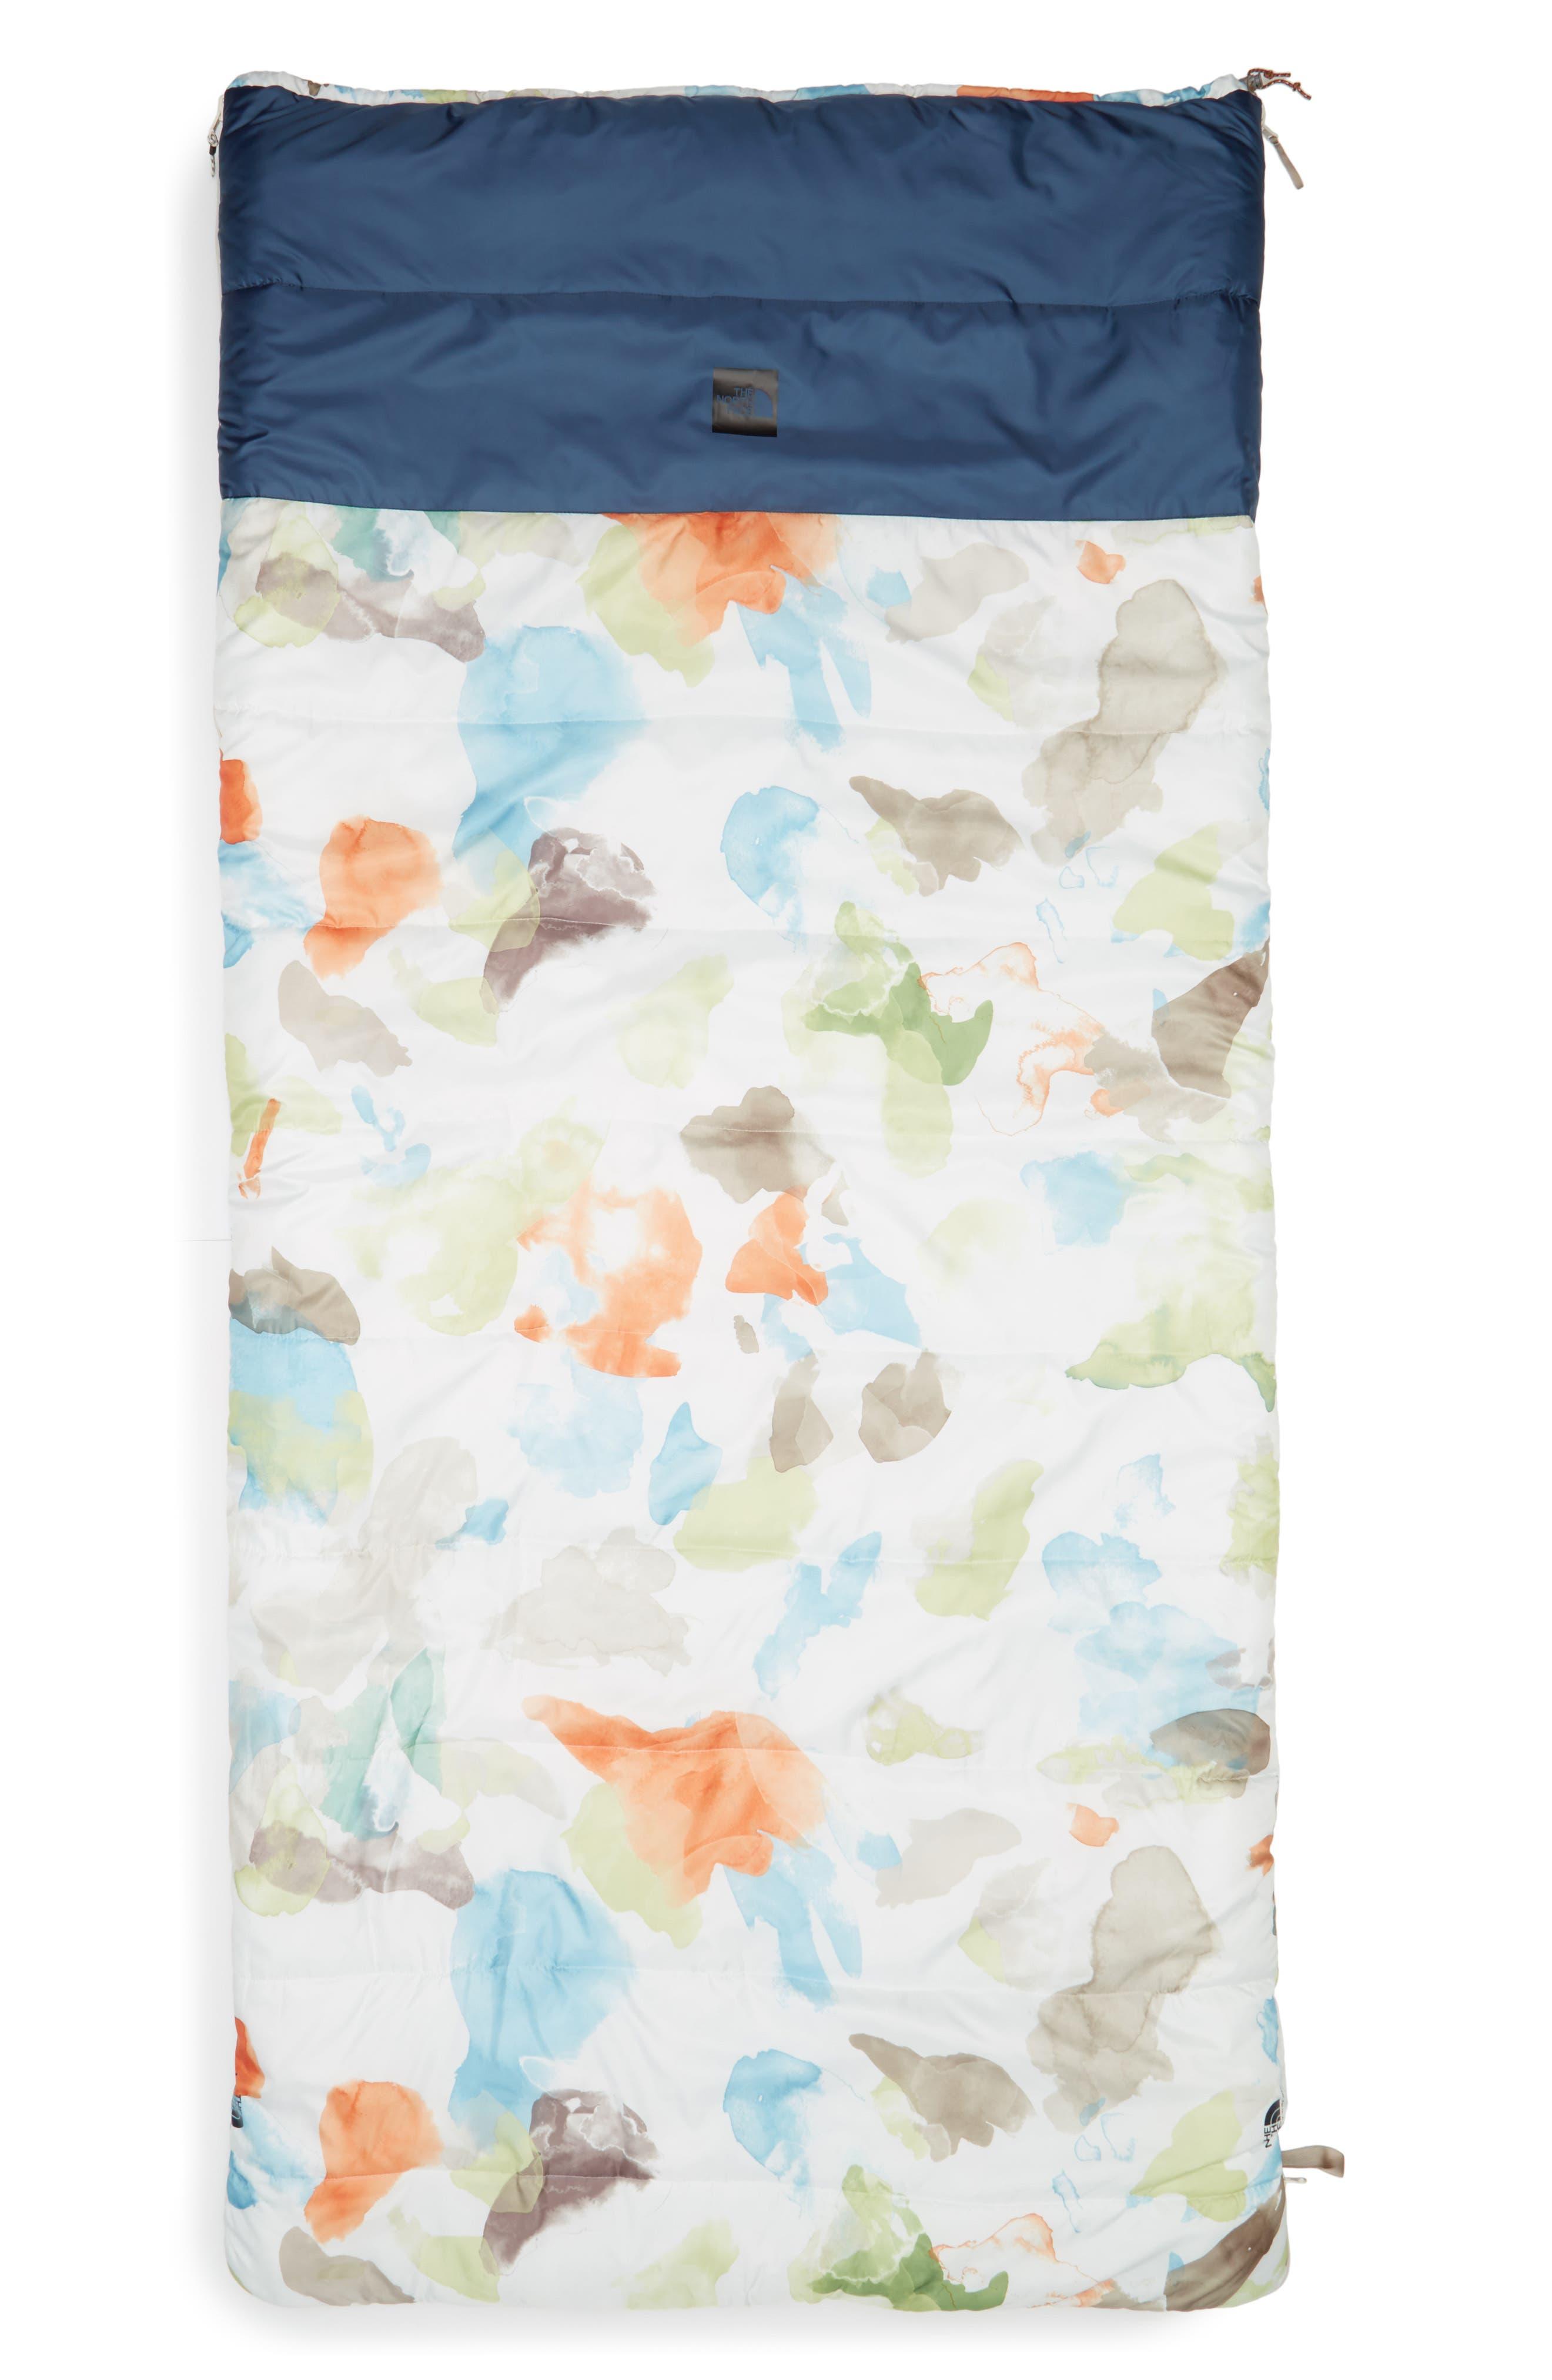 Homestead Twin Extra-Large Sleeping Bag,                         Main,                         color, 100